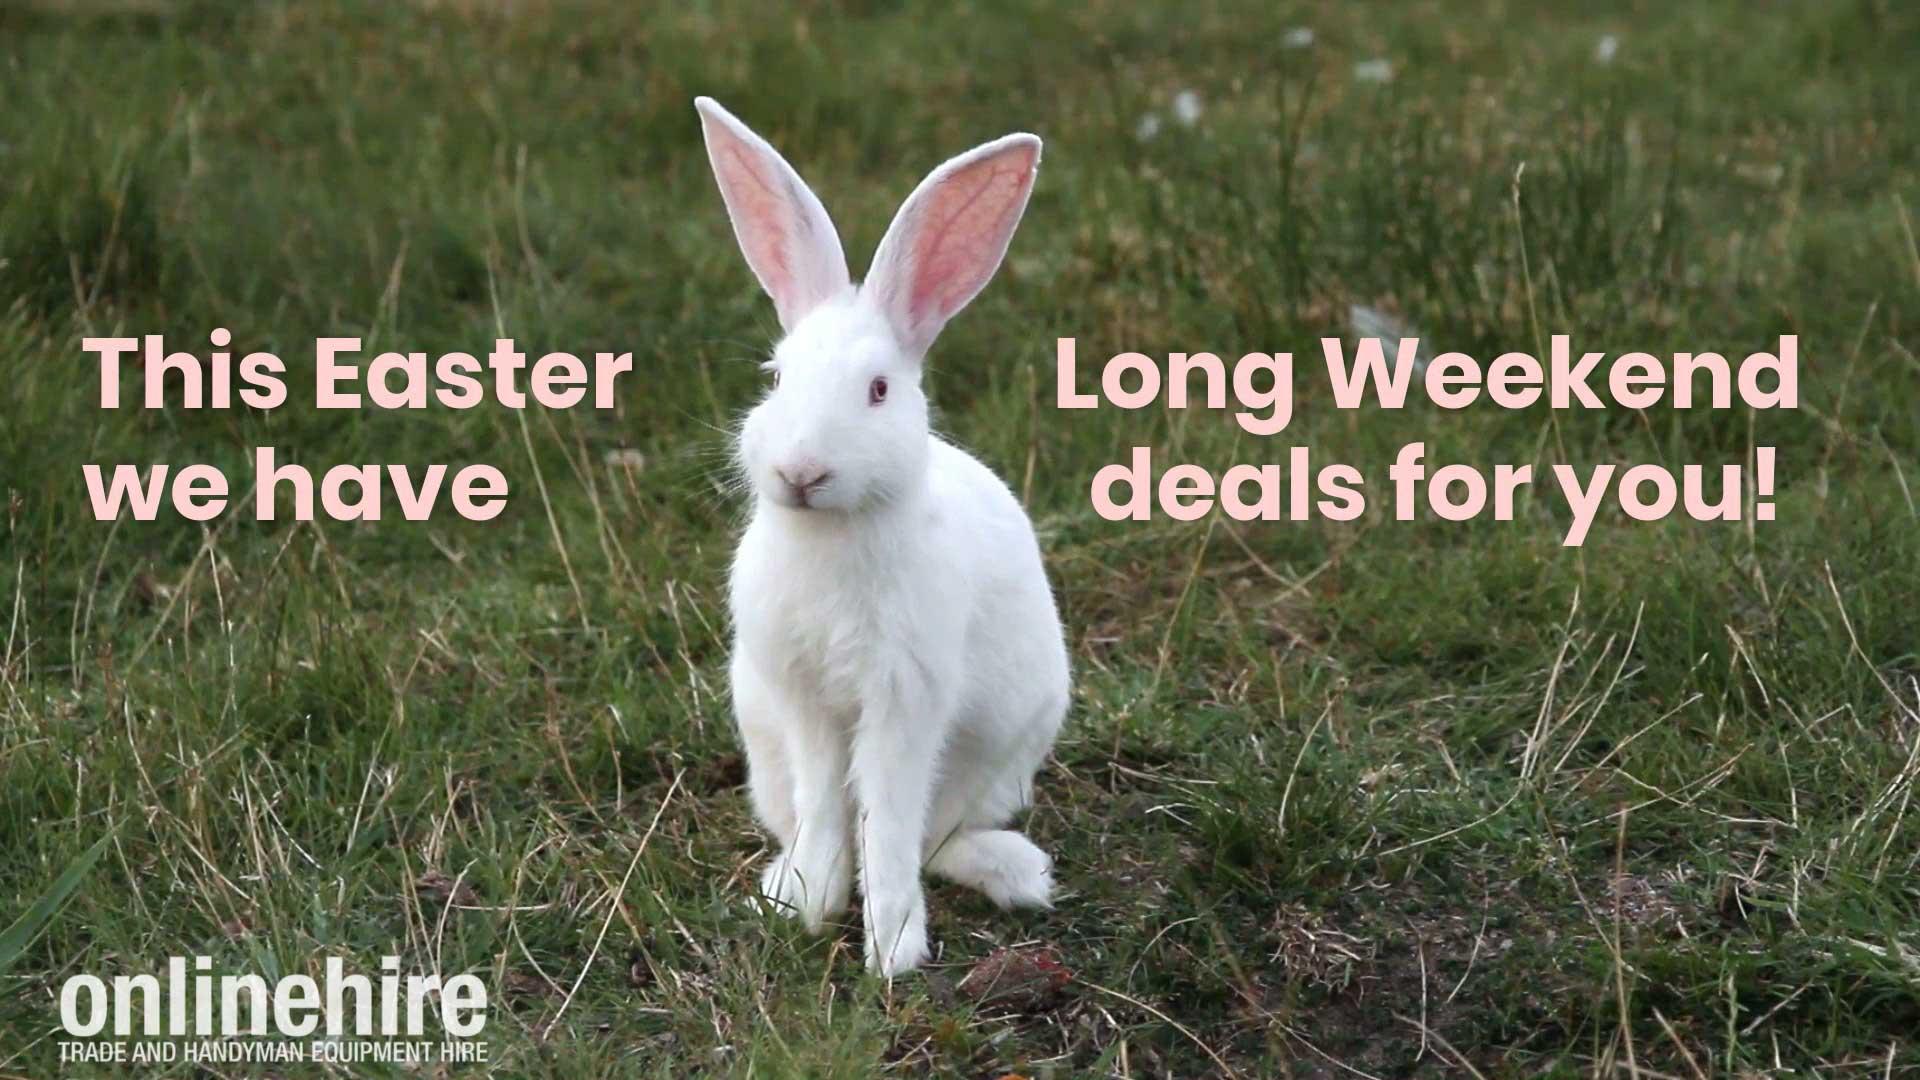 Online Hire Easter Long Weekend Deals